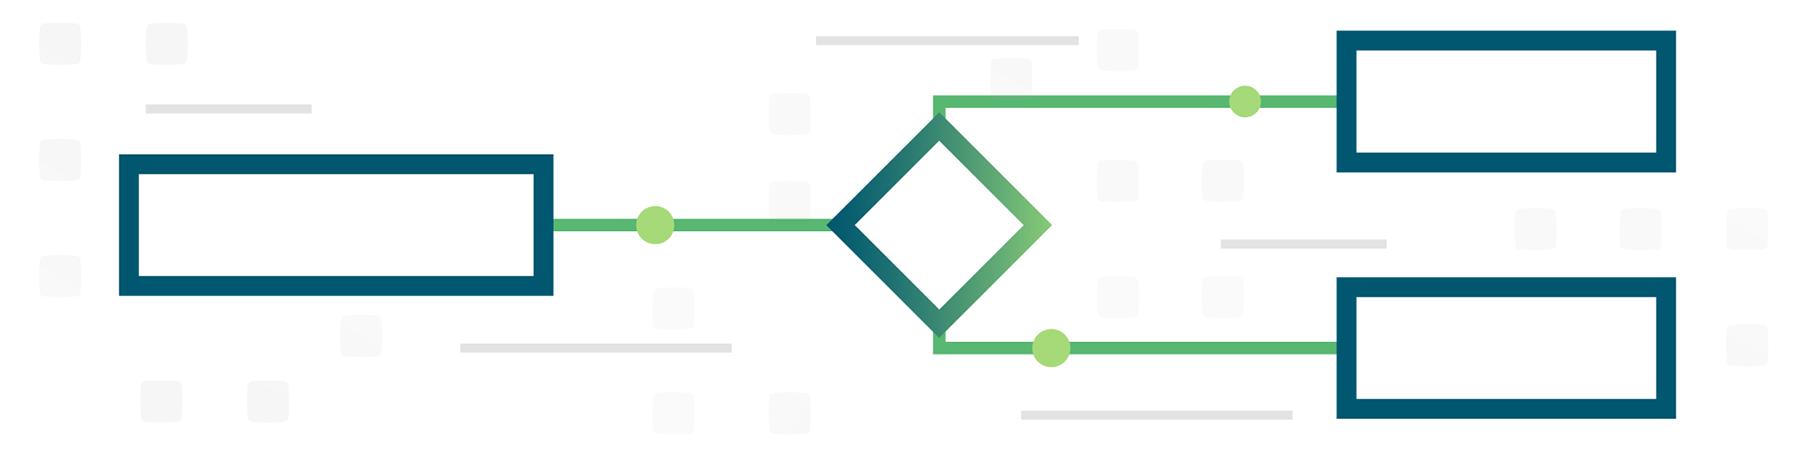 redapt_blog-graphics_workflow